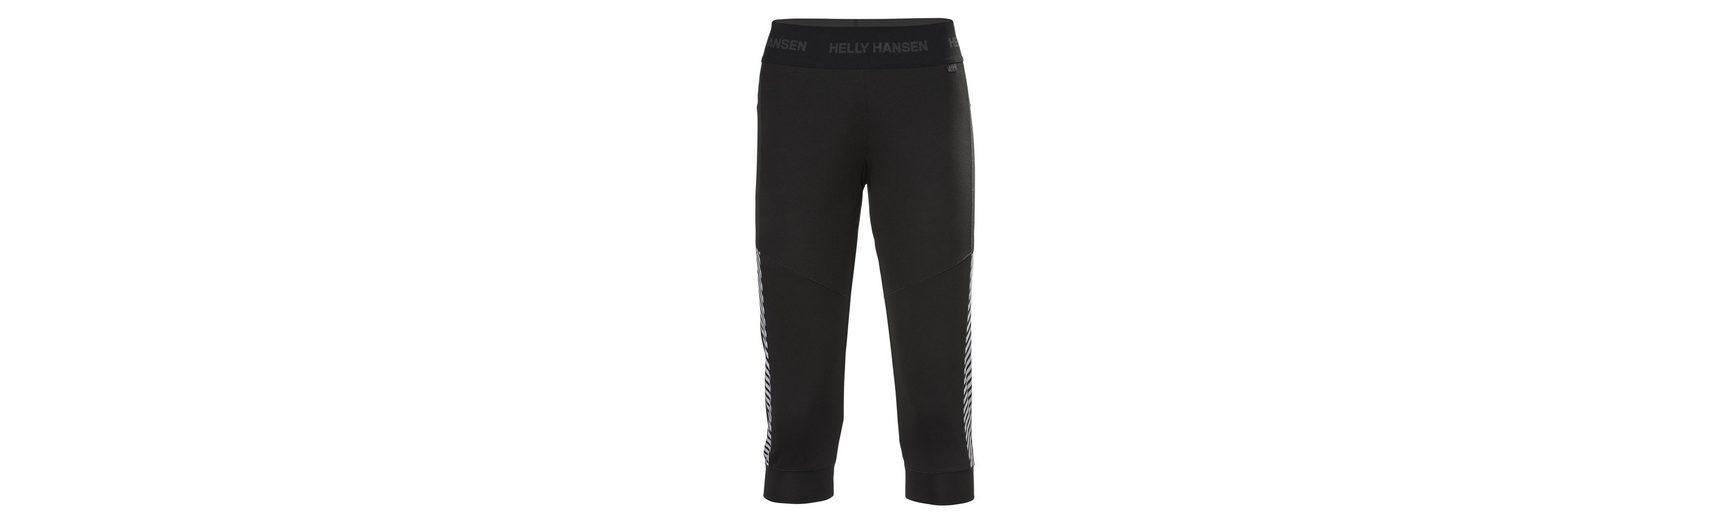 3 4 Damen Sportbekleidung TOP Helly Hansen PANT BOOT LIFA FwZ1xqg